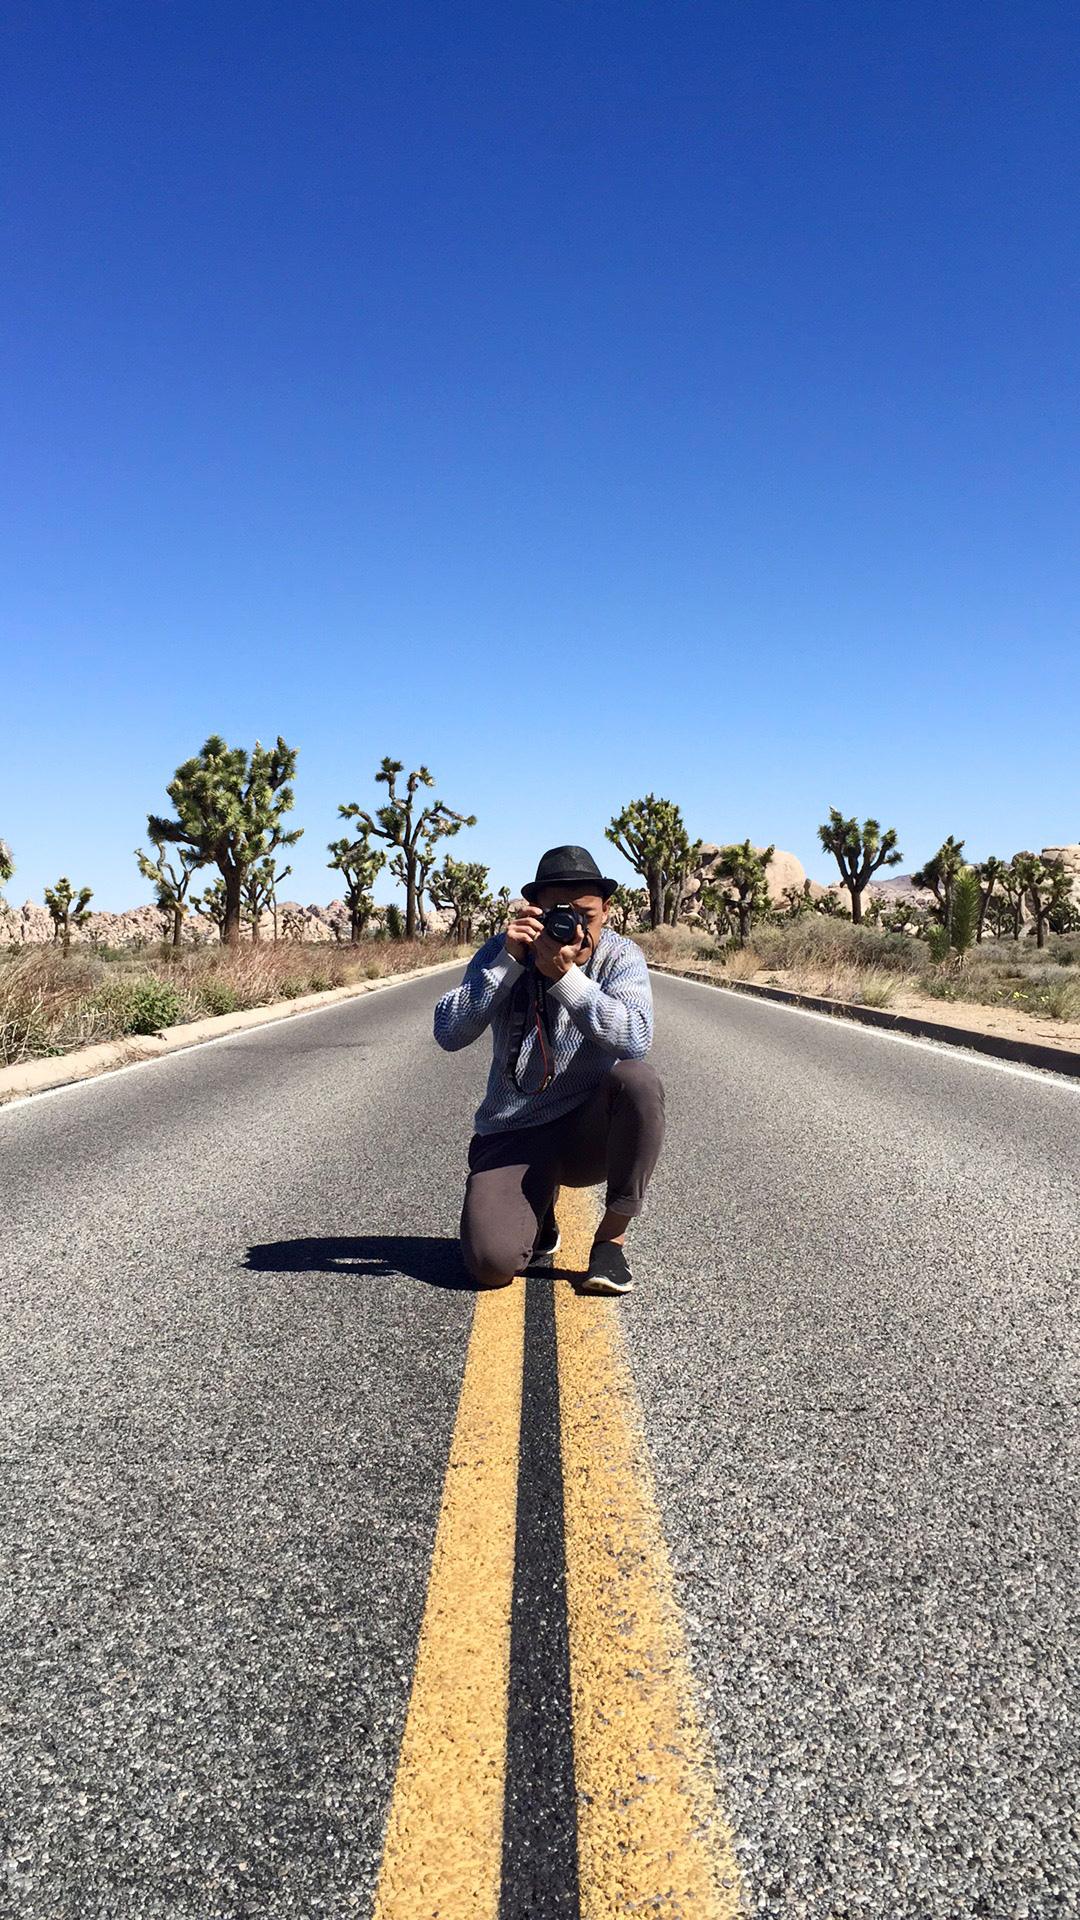 Jack the Photographer